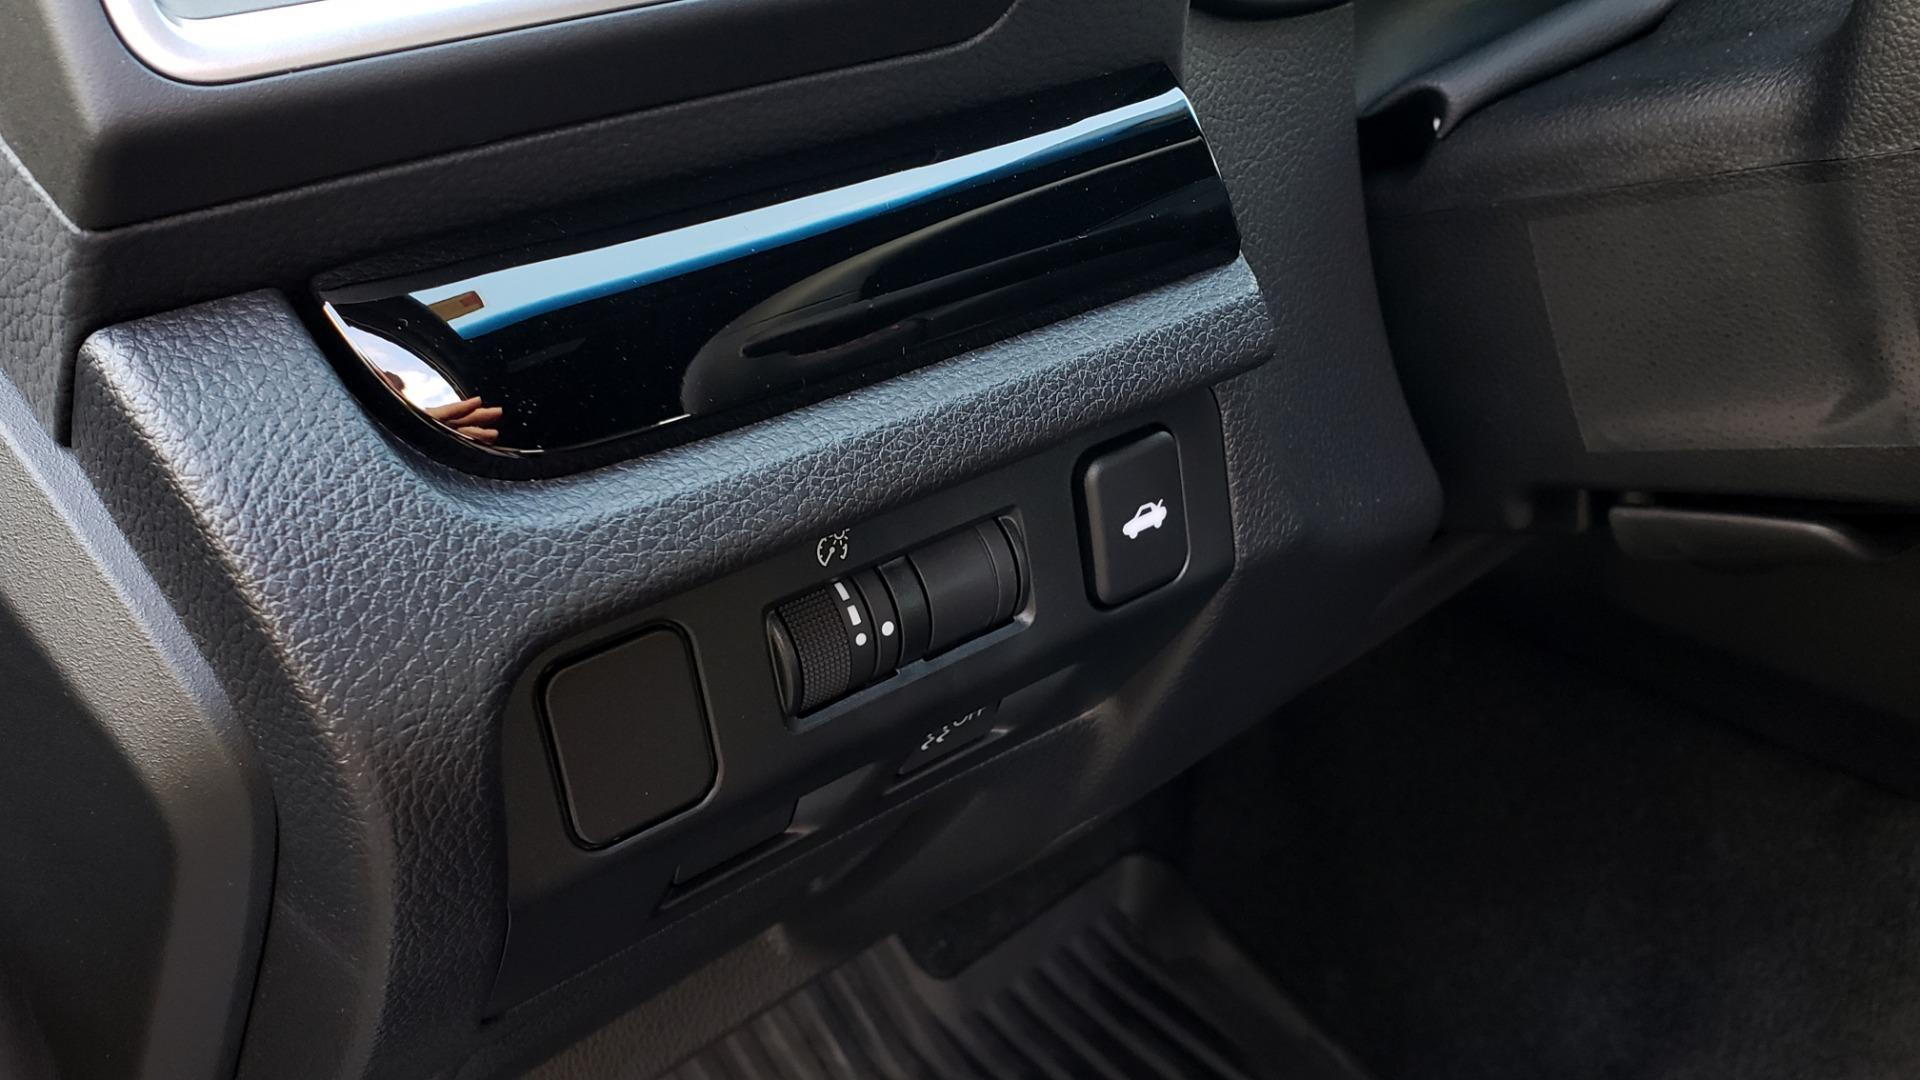 Used 2020 Subaru WRX STI 2.5L TURBO / 6-SPEED MANUAL / RECARO SEATS / REARVIEW for sale Sold at Formula Imports in Charlotte NC 28227 32